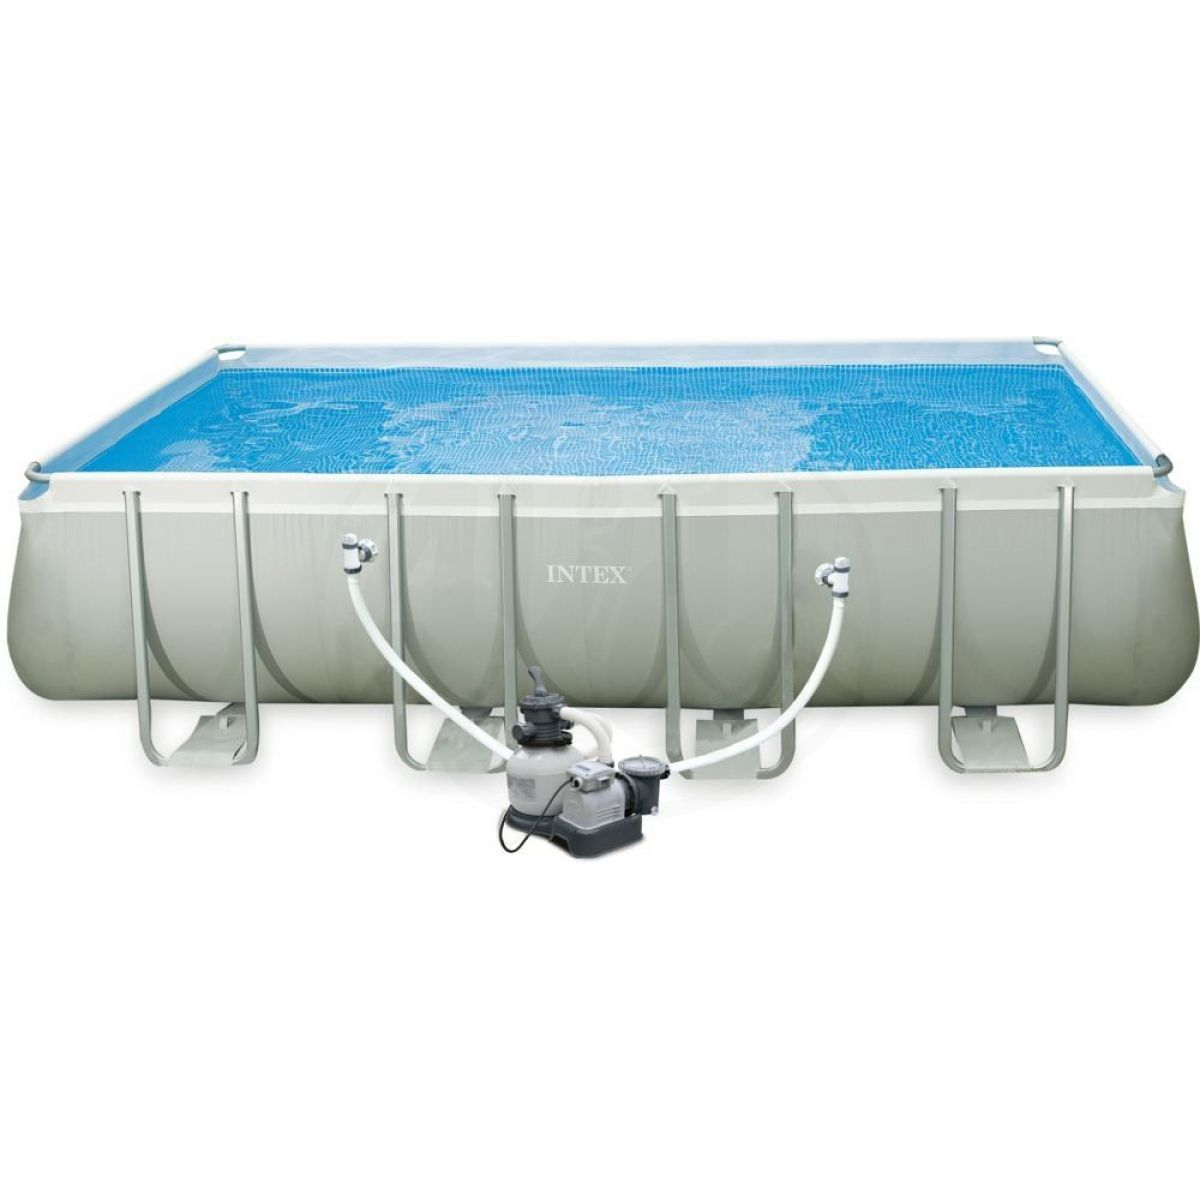 Intex 28352 ultra frame pool 5 49 x 2 74 x 1 32 m 4kids for Piscine intex ultra frame 5 49x1 32